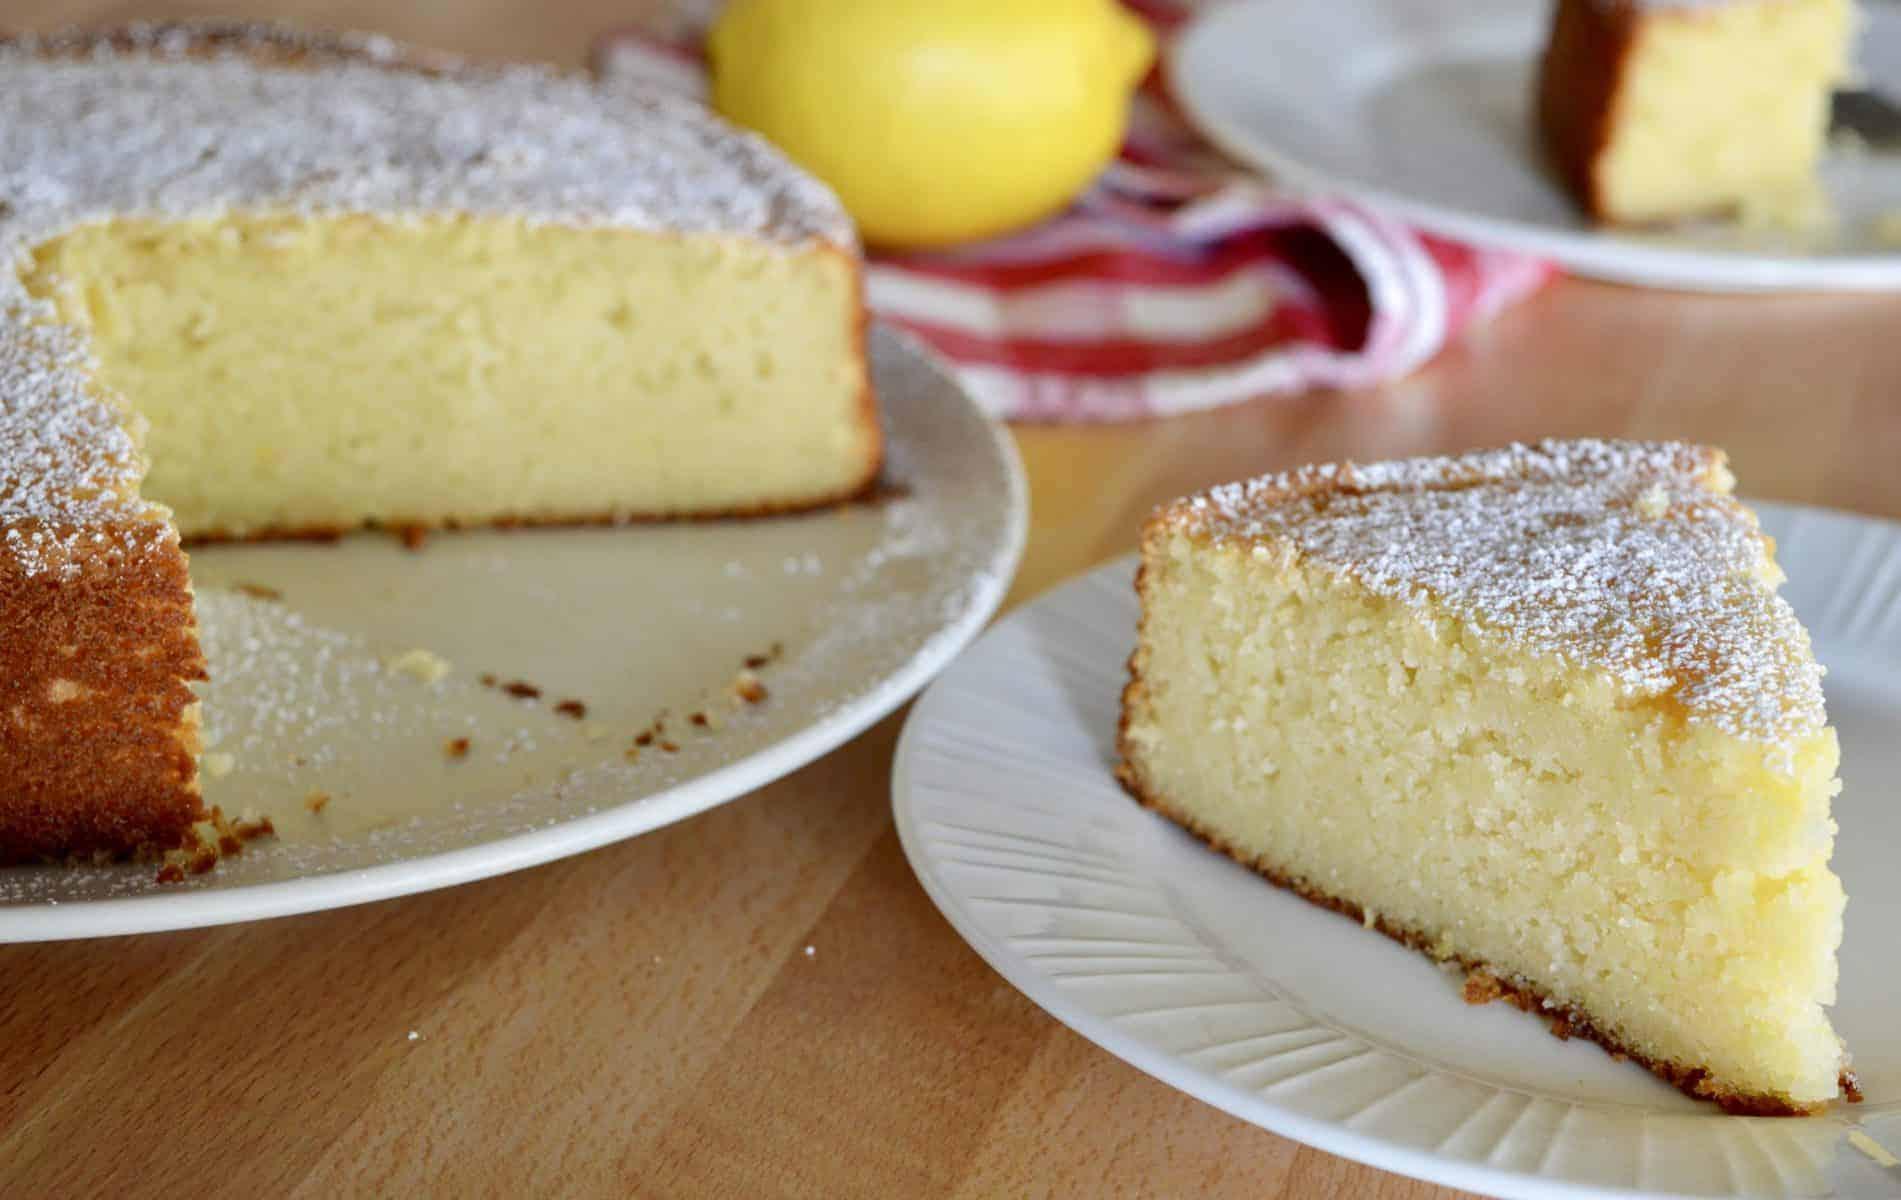 Italian Lemon ricotta cake recipe